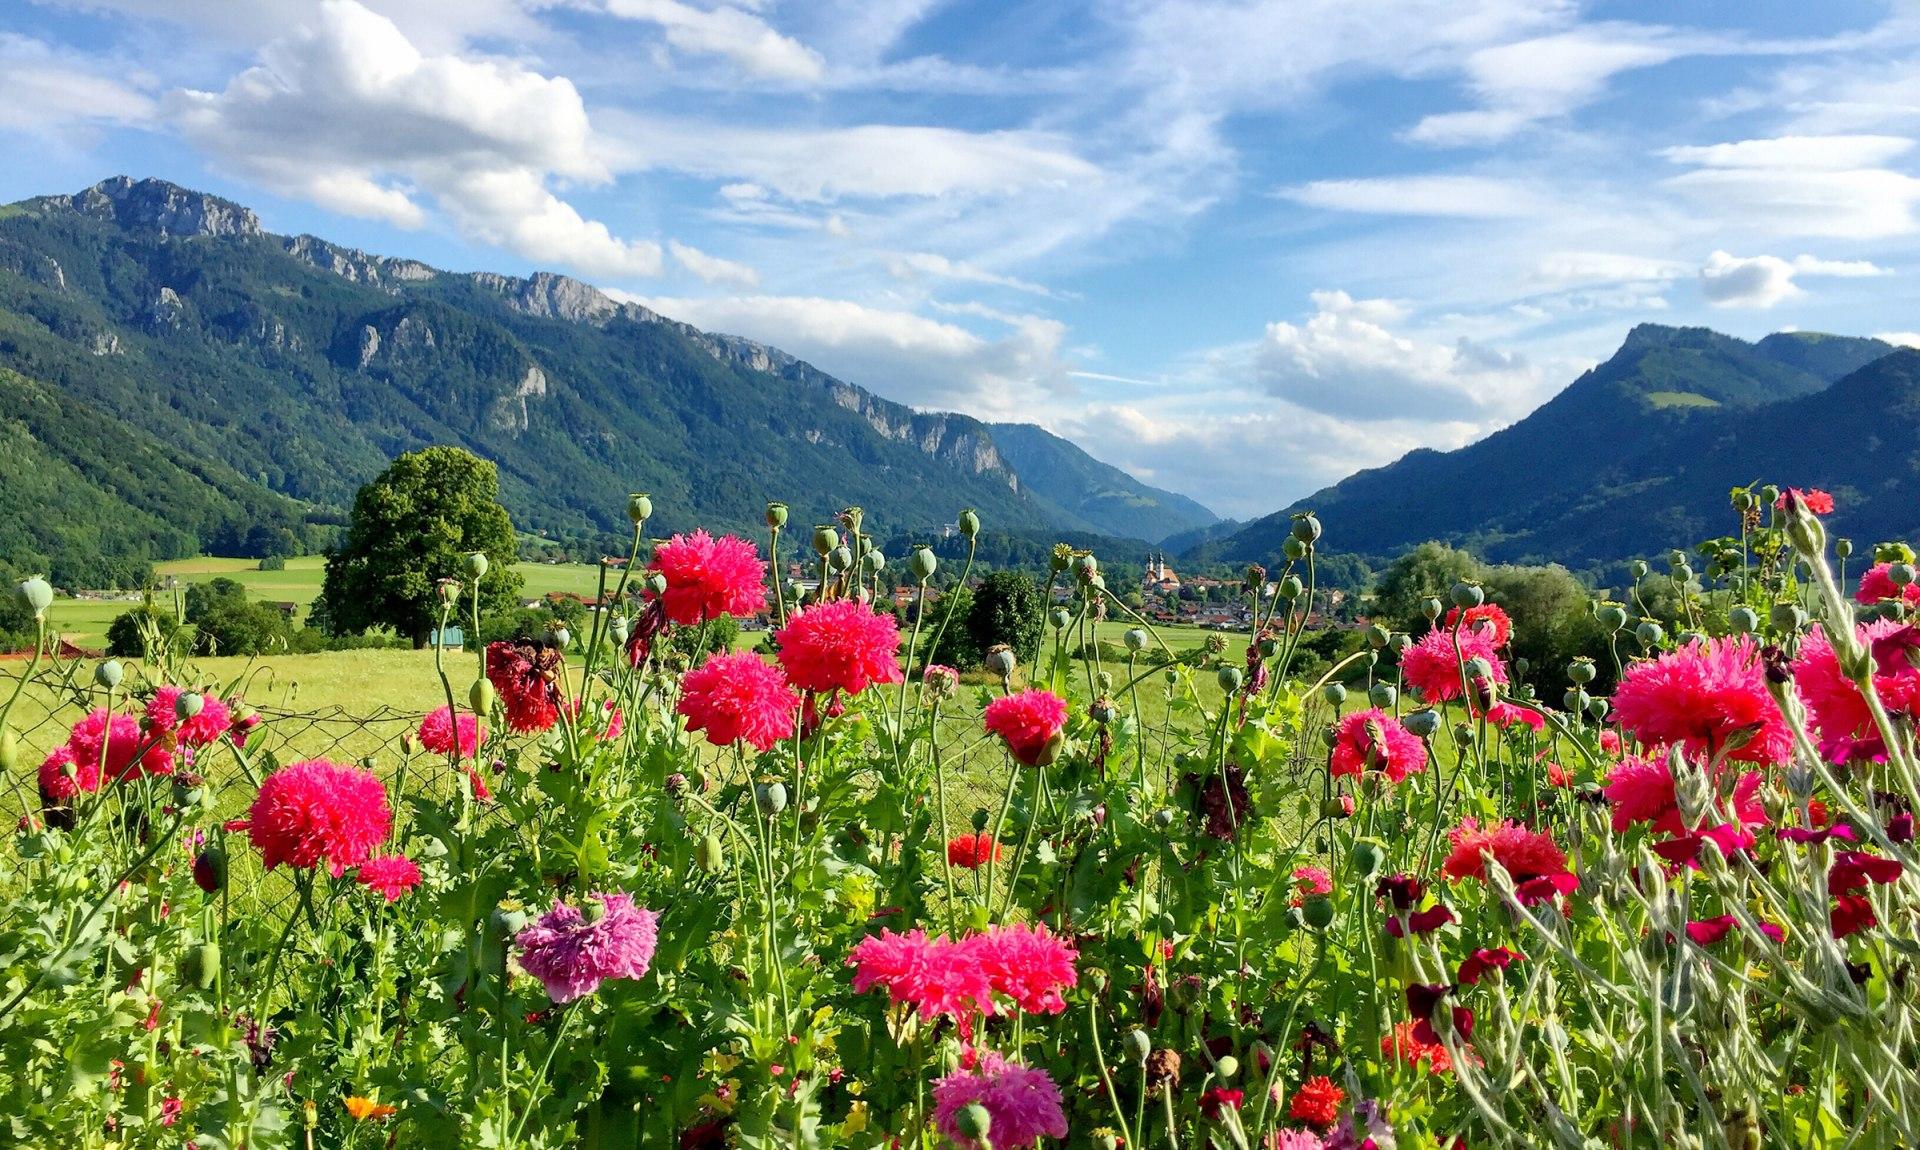 Landschaft Blumen, © Herbert Reiter